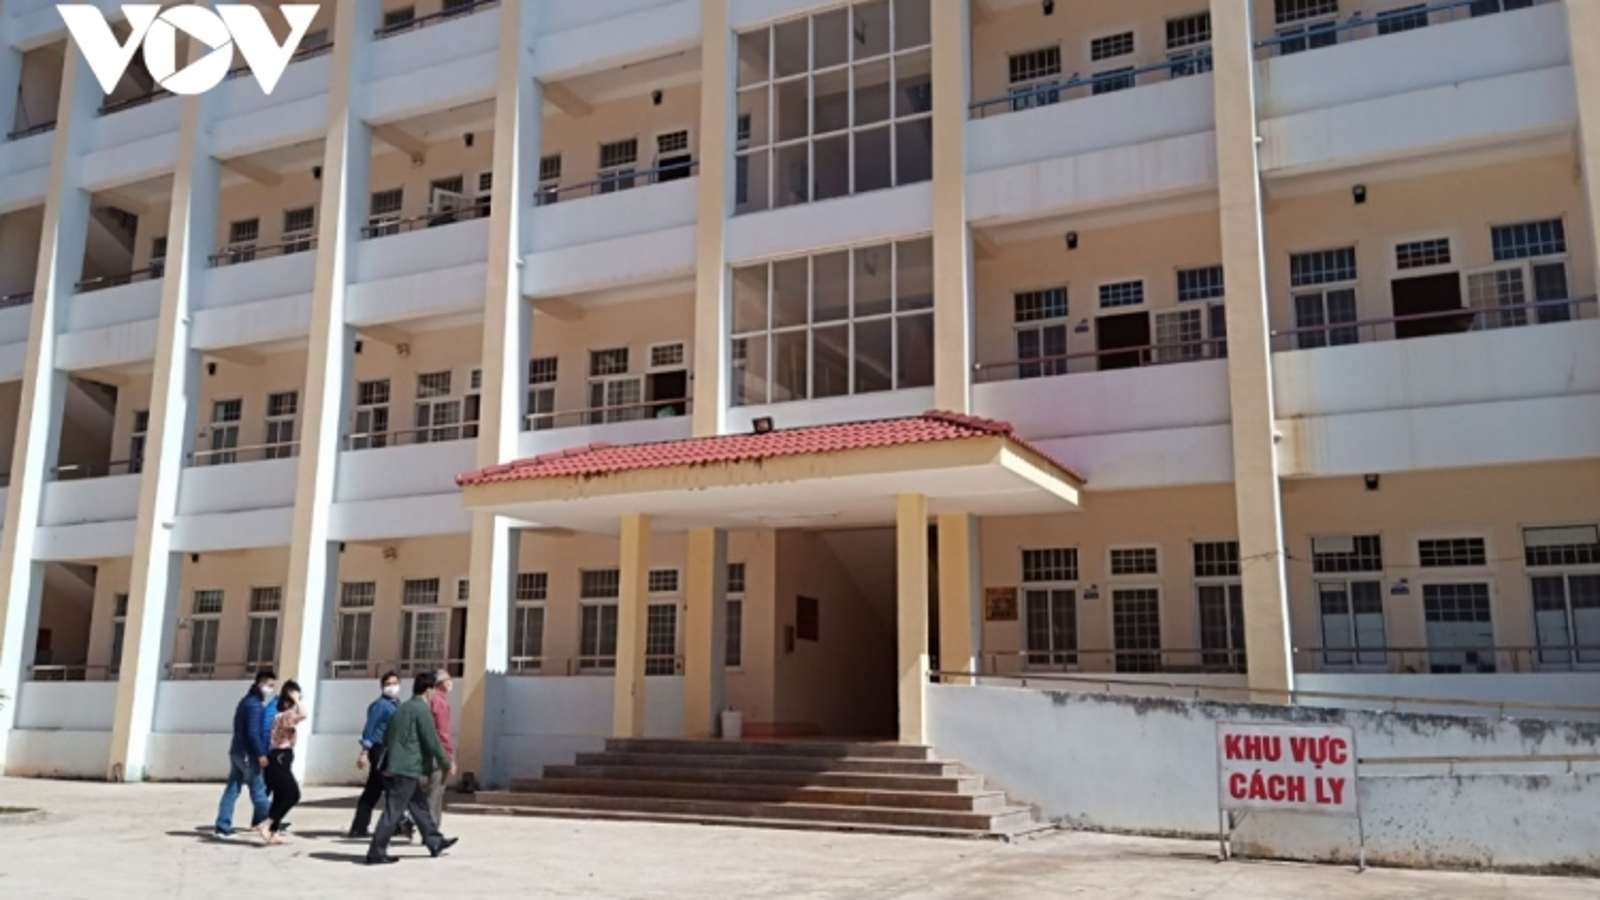 Vietnam extends COVID-19 quarantine to 21 days